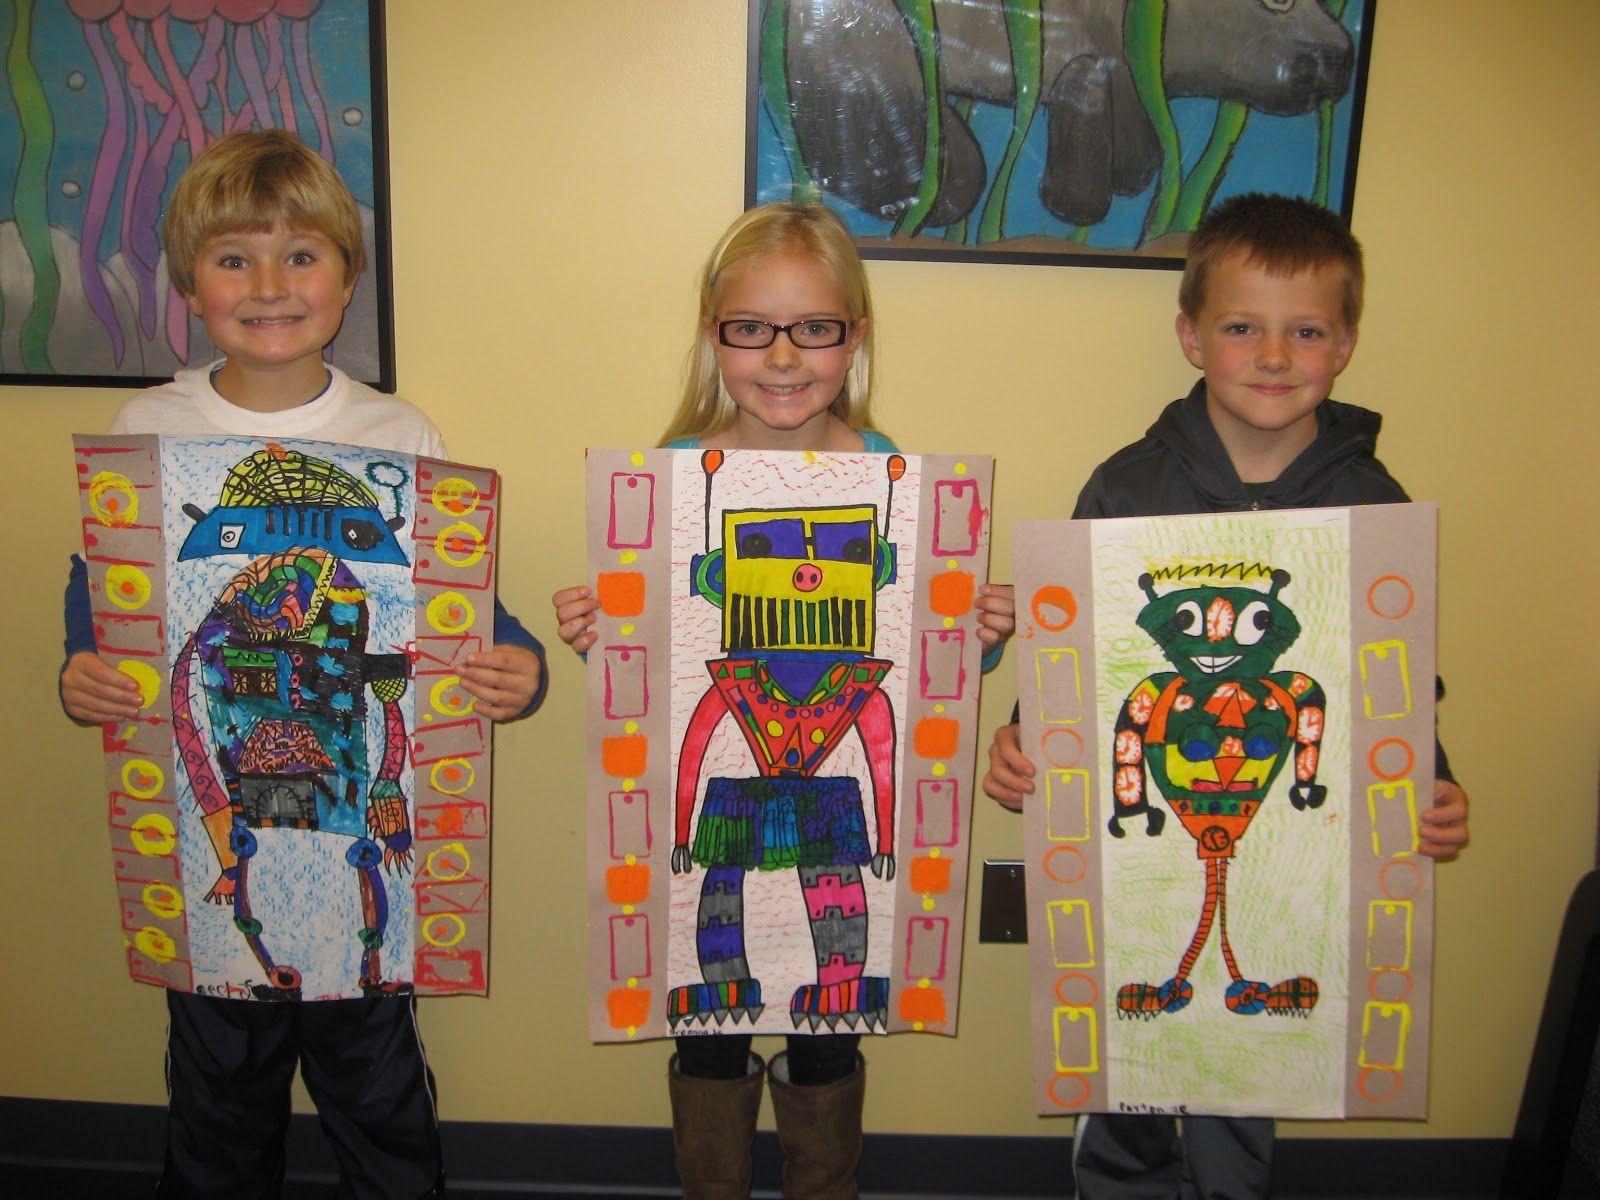 Davinci Inspired Robot Art By 2nd Graders